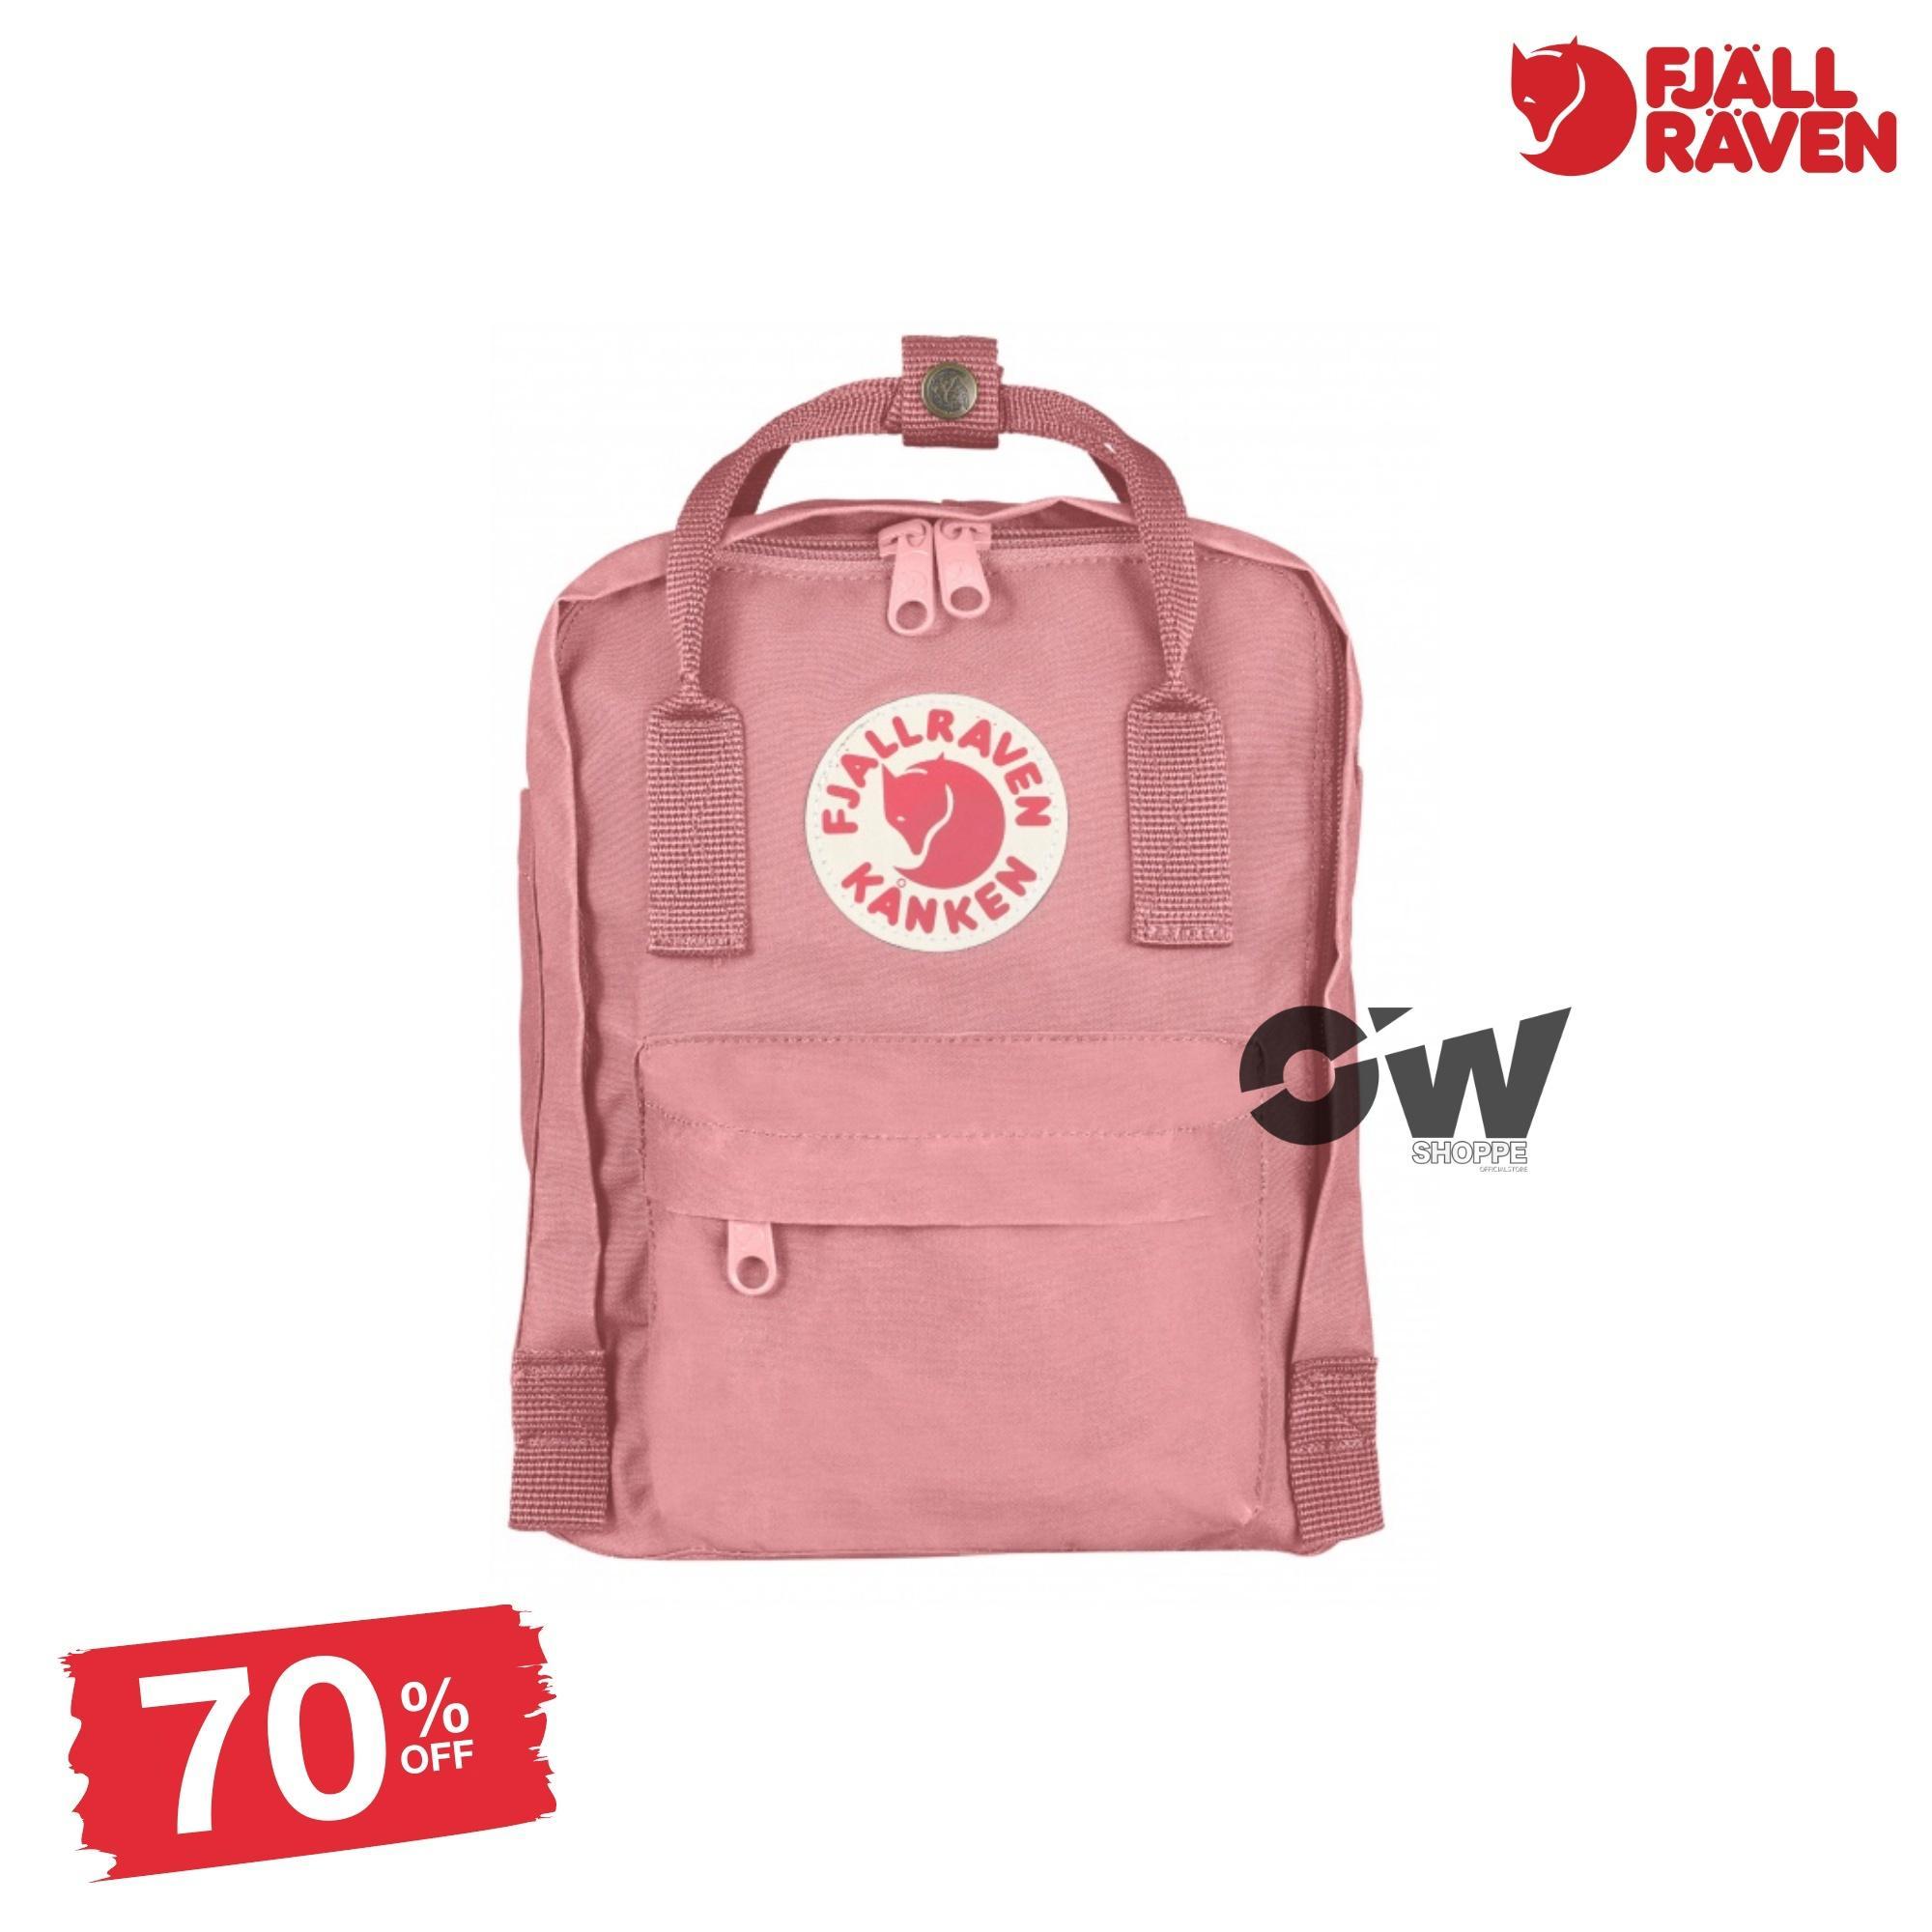 b4f63451c54 Fjallraven Kanken Philippines: Fjallraven Kanken price list - Laptop ...